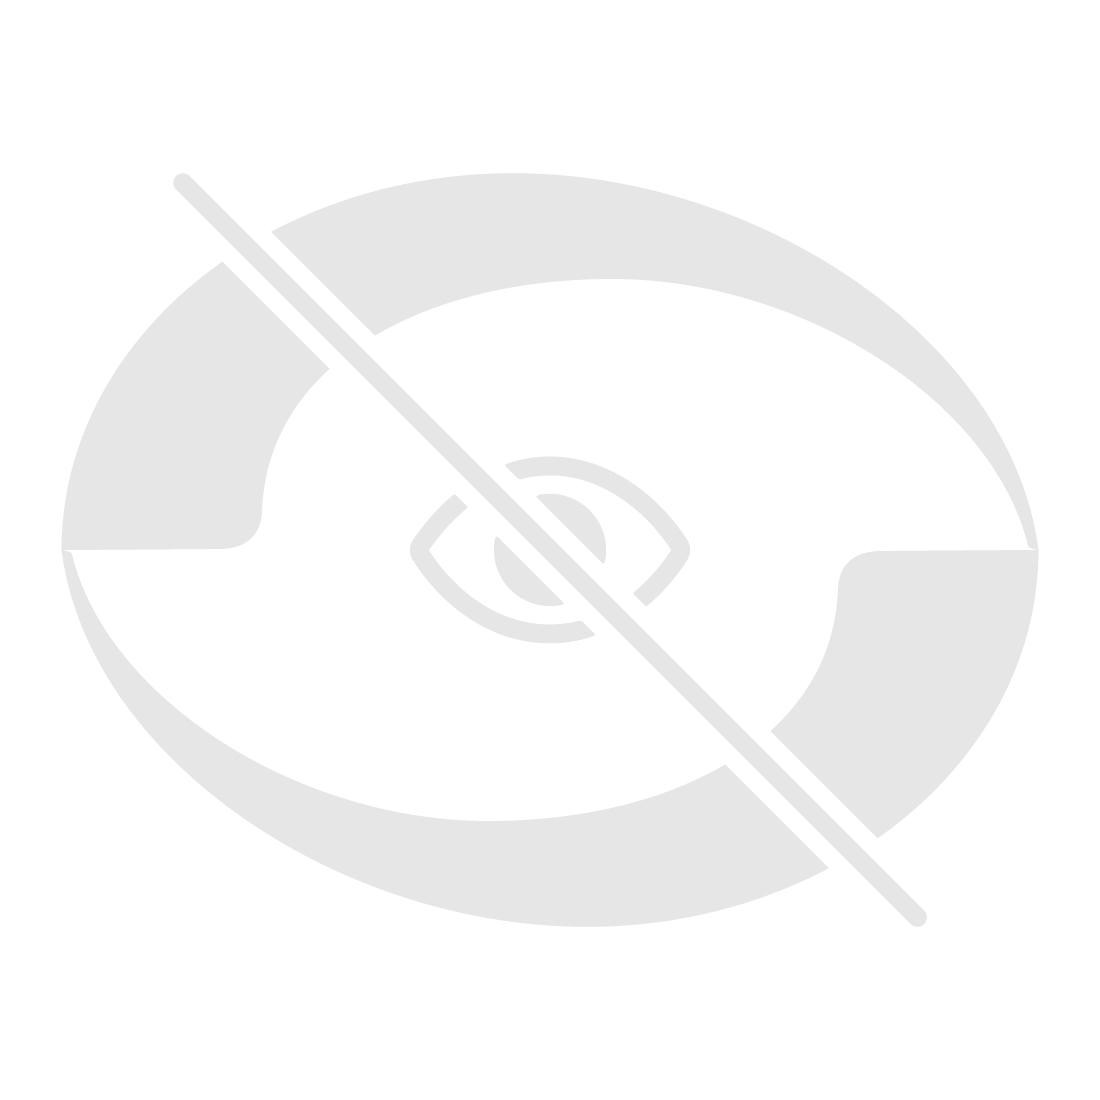 GeoVision GV-650B-04 • 4 channel hybrid video capture card